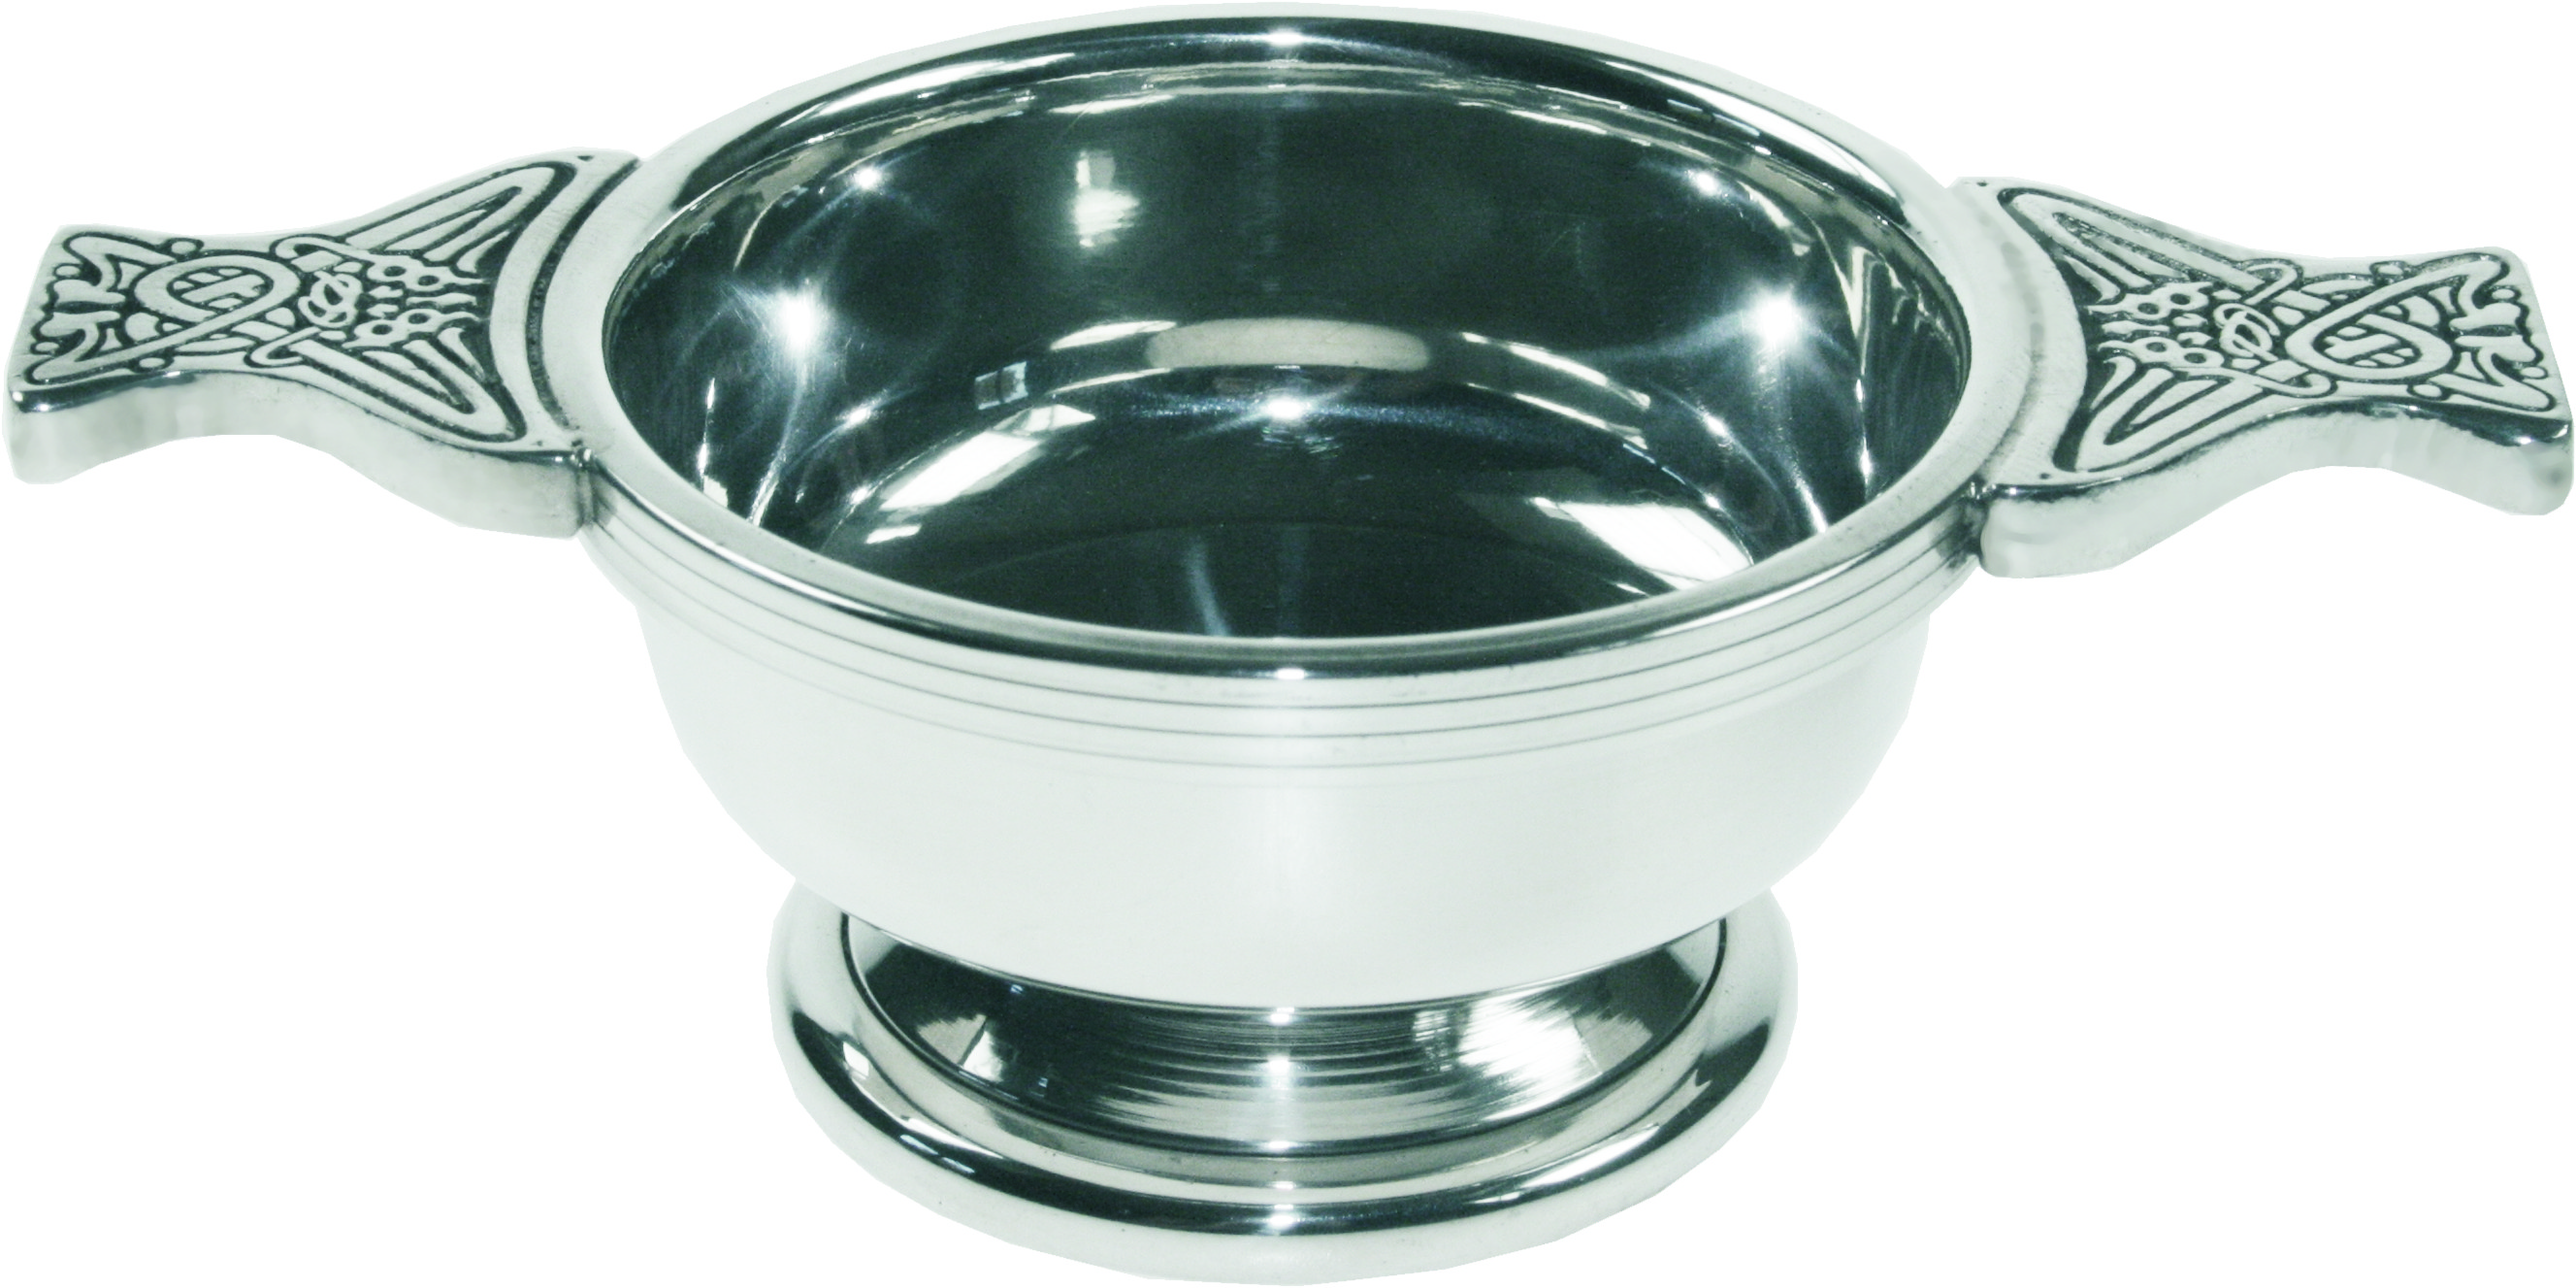 "Pewter Quaich Bowl with Celtic Patterned Handle 7cm (2.75"")"